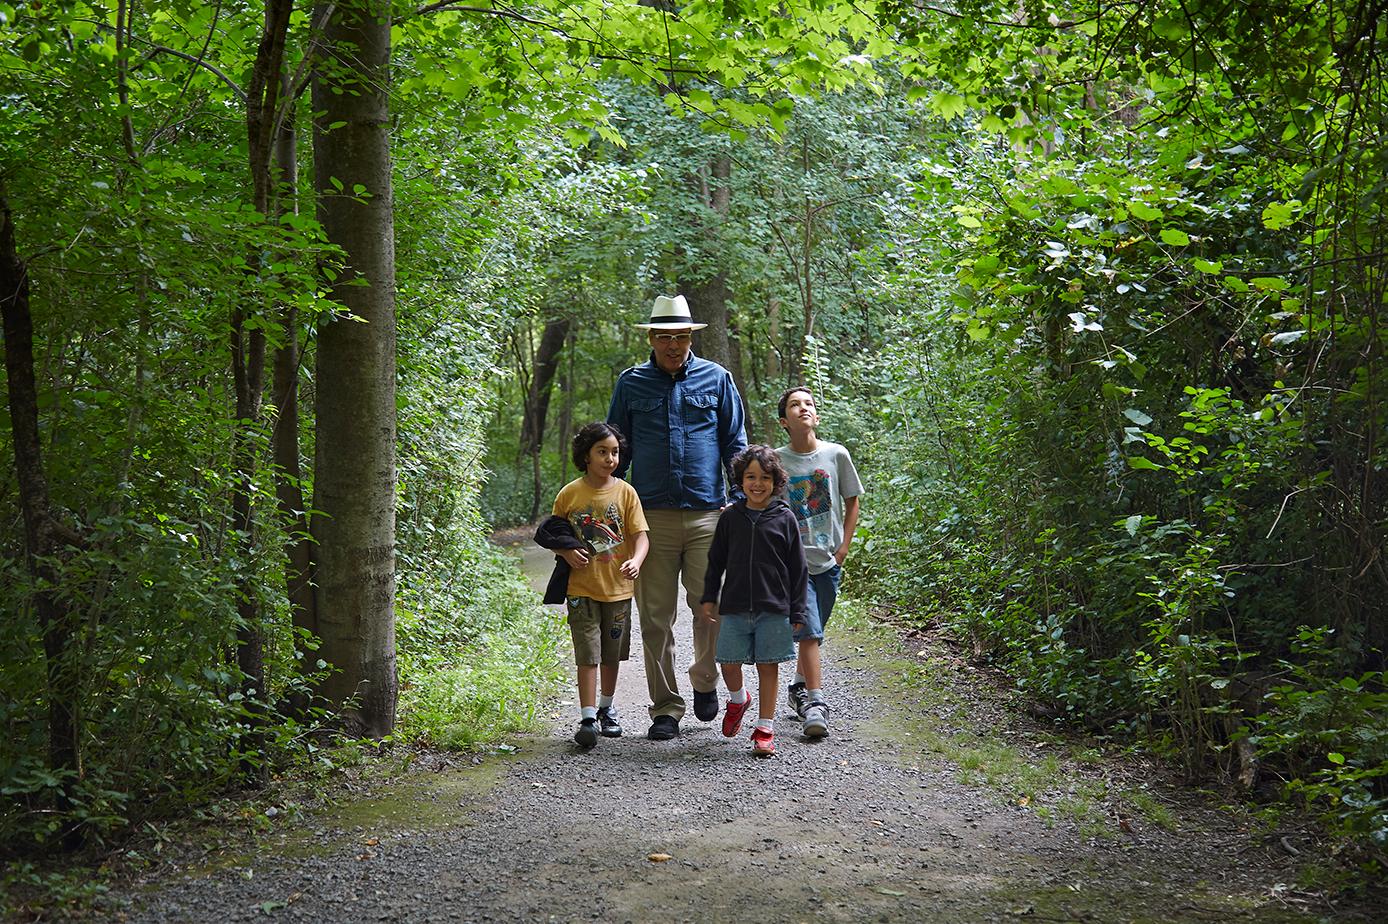 Stroll through the forest in Pointe-aux-Prairies Nature Park (credit: Alexandre Campeau-Vallée)